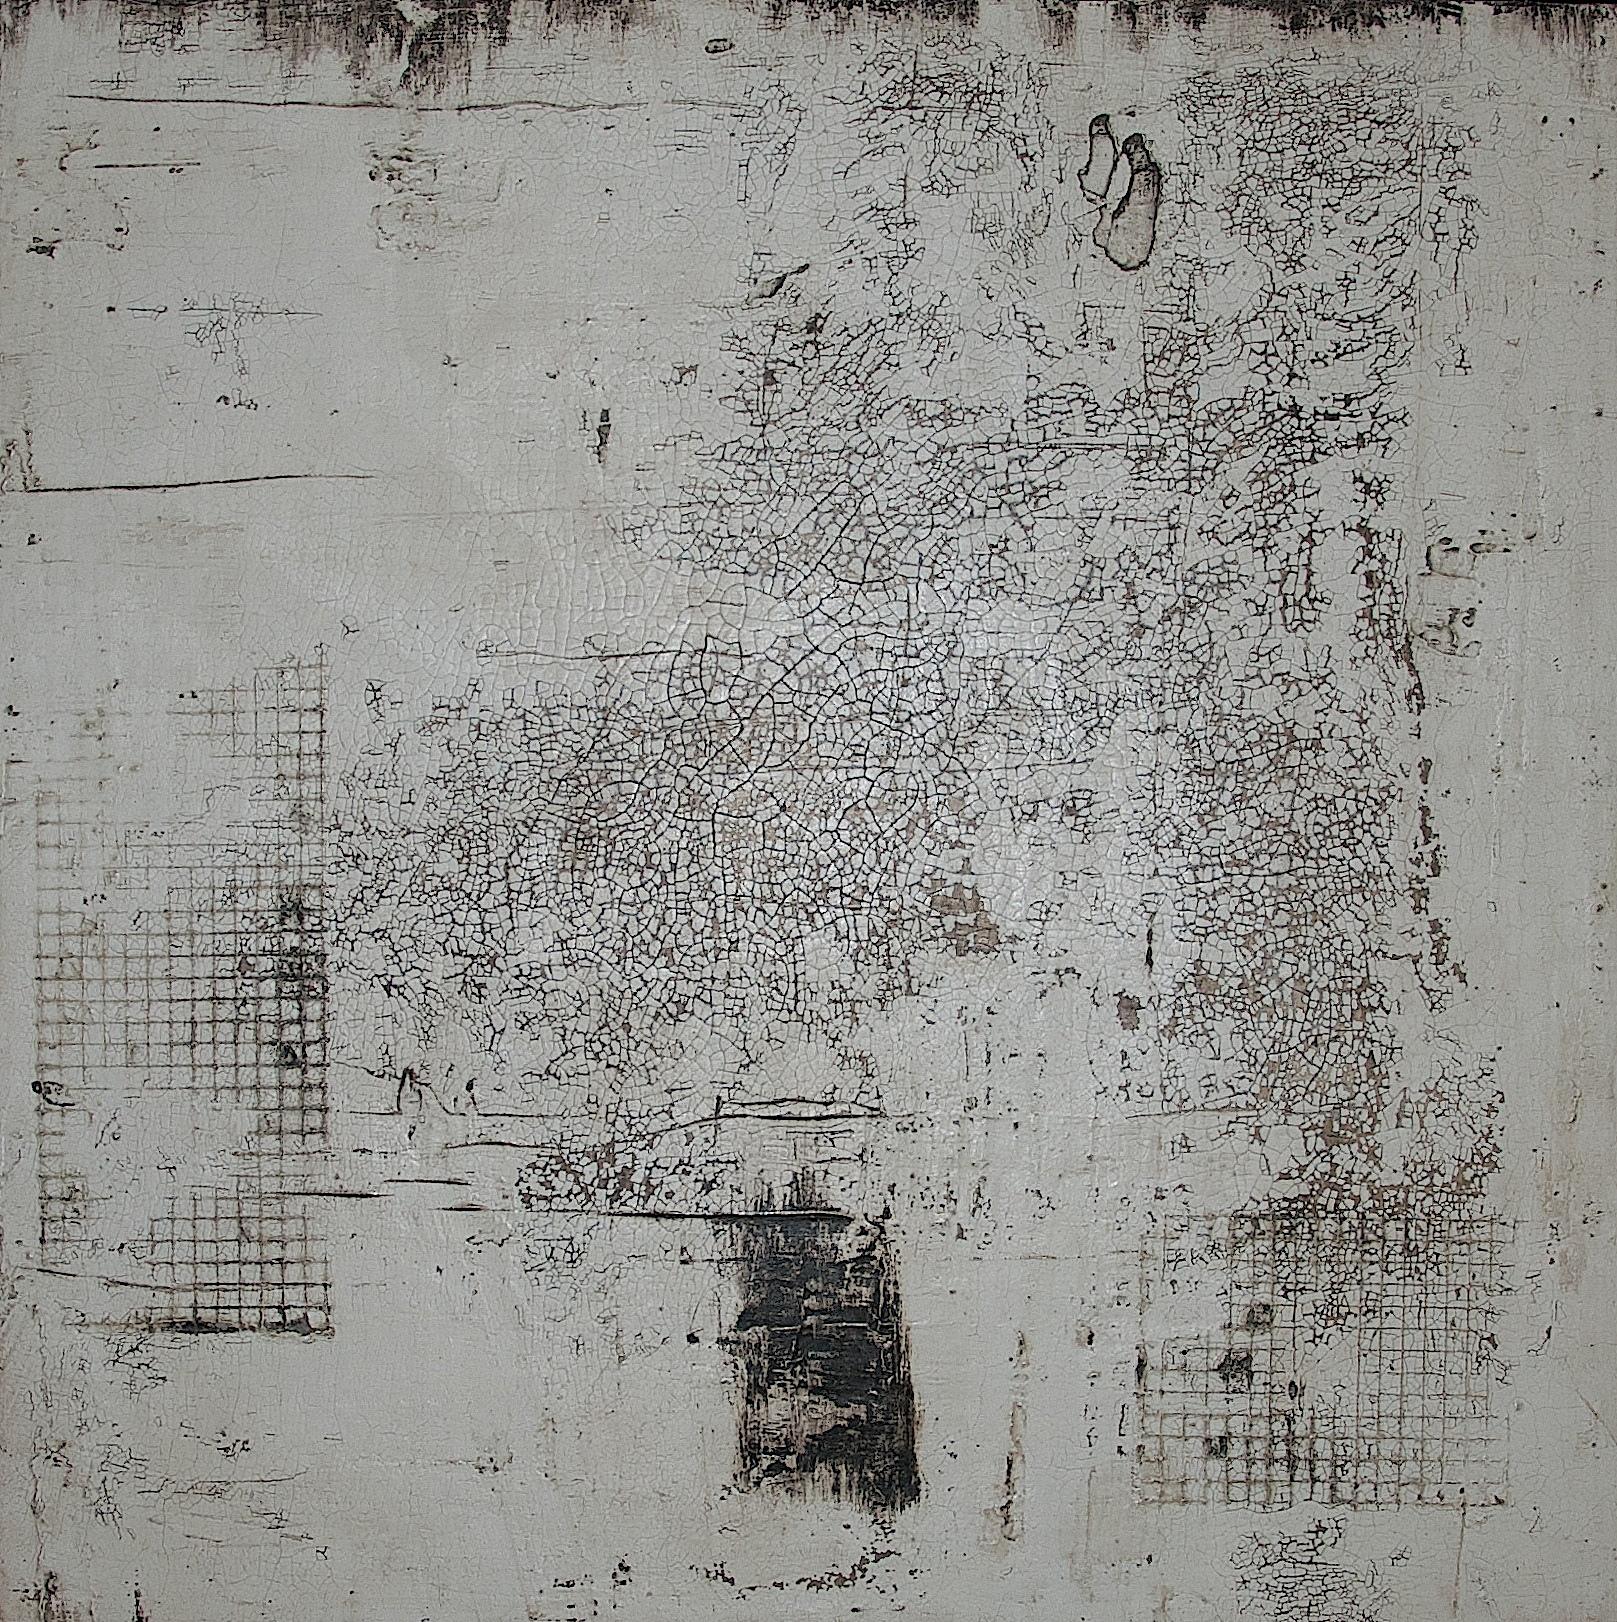 Fresko/Intonaco_Sumpfkalk_Pigmente_Wachs_Bauplatte_60 x 60 cm